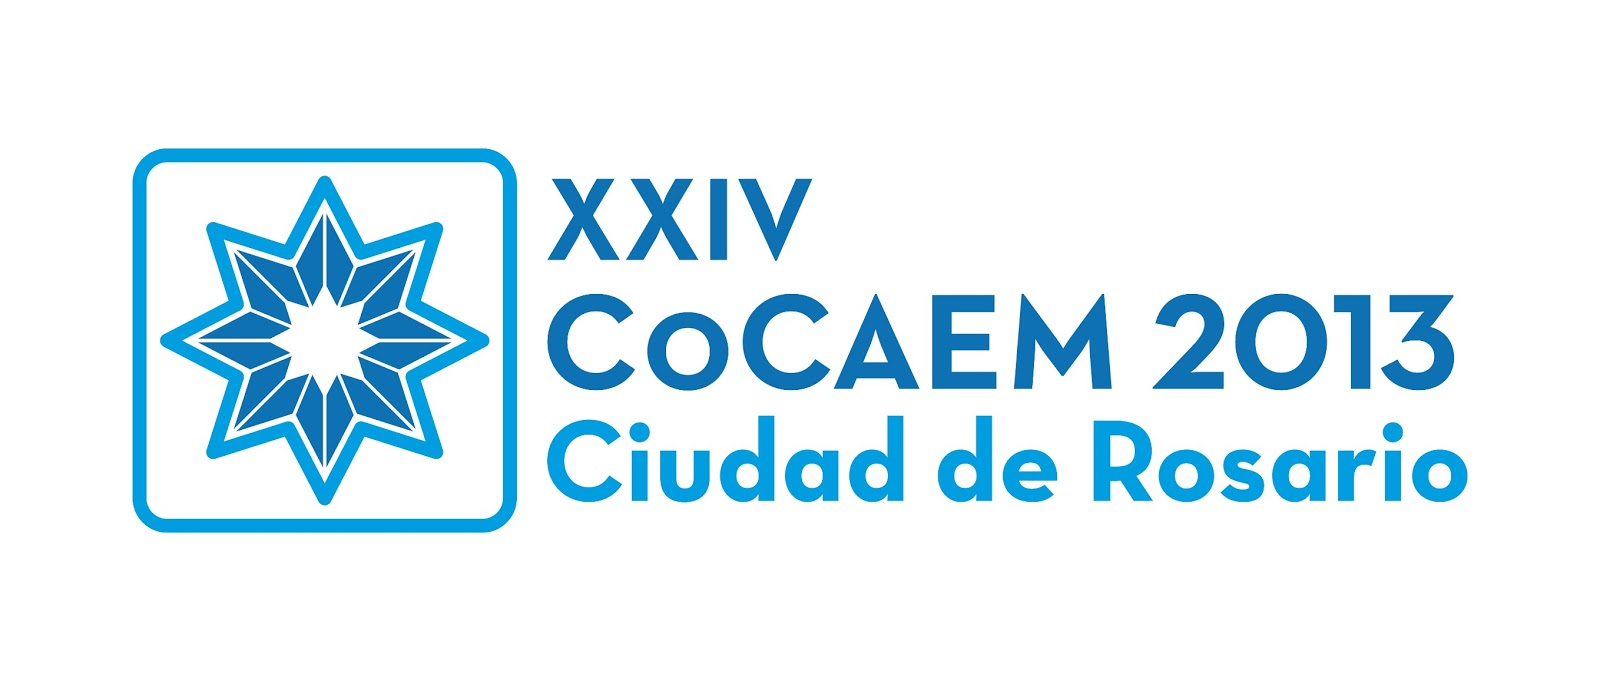 Cocaem 2013-01